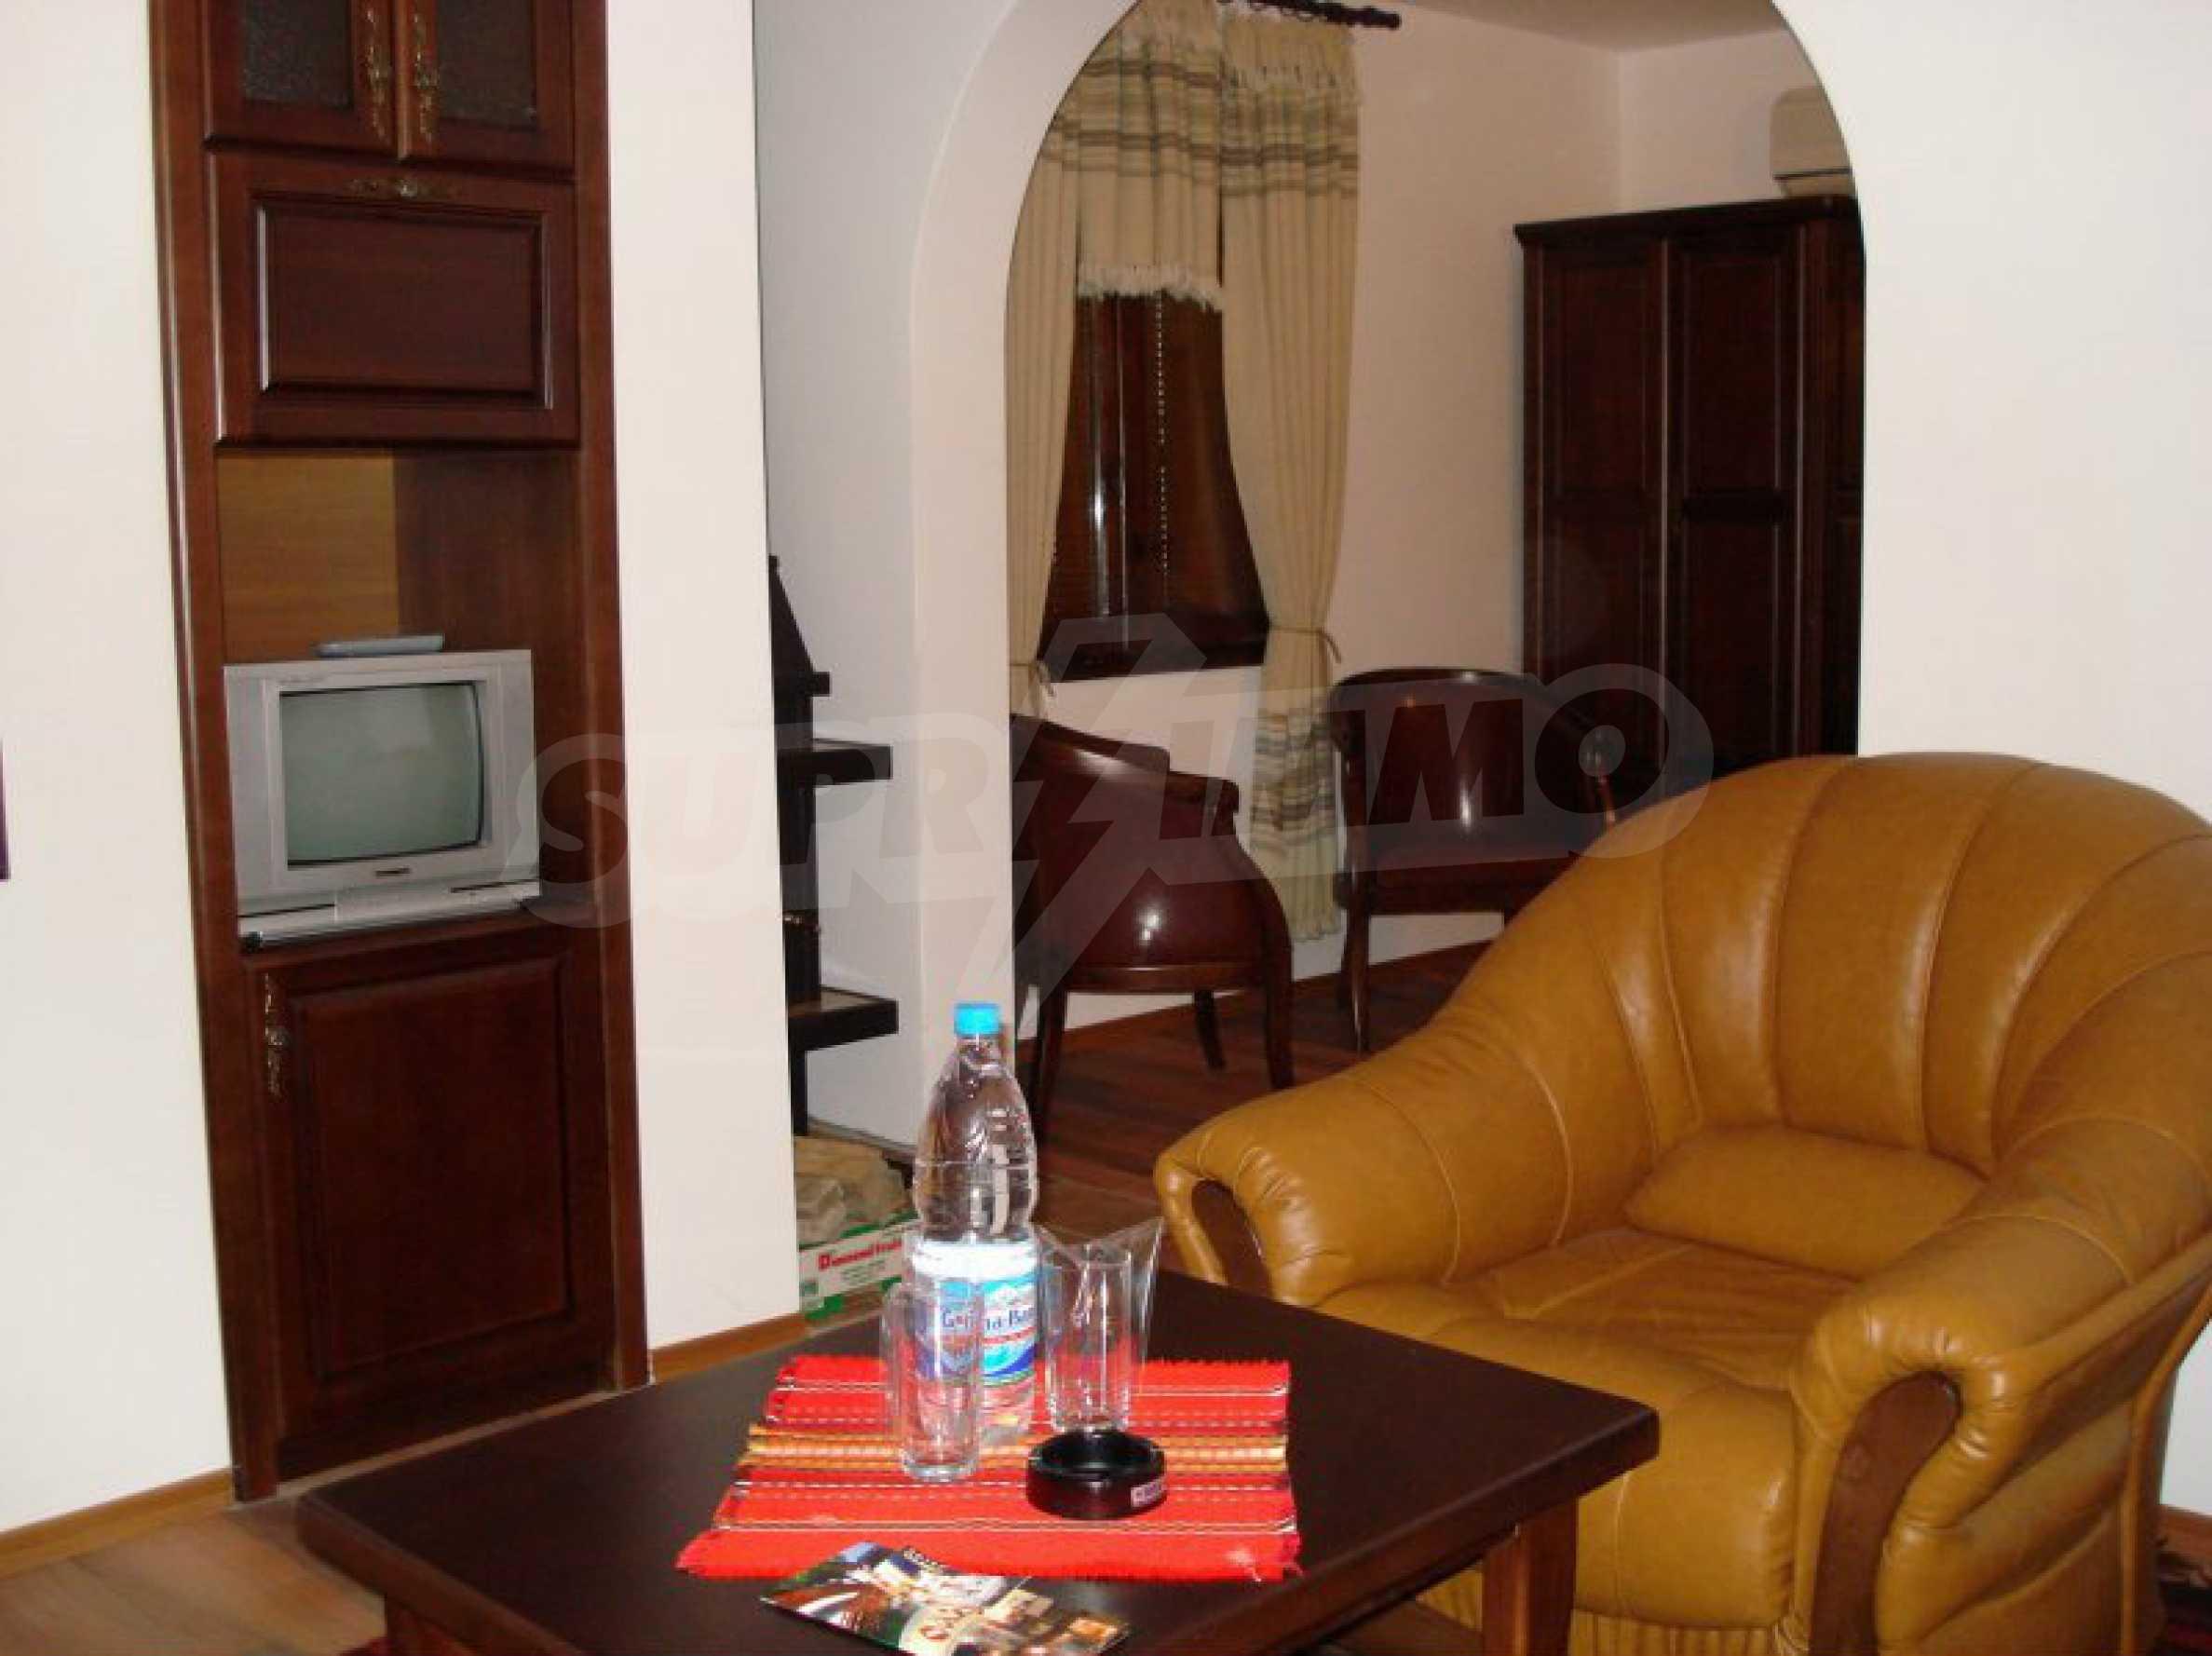 Hotelanlage mit Restaurant am Ufer des Flusses Osam in Lovech 43